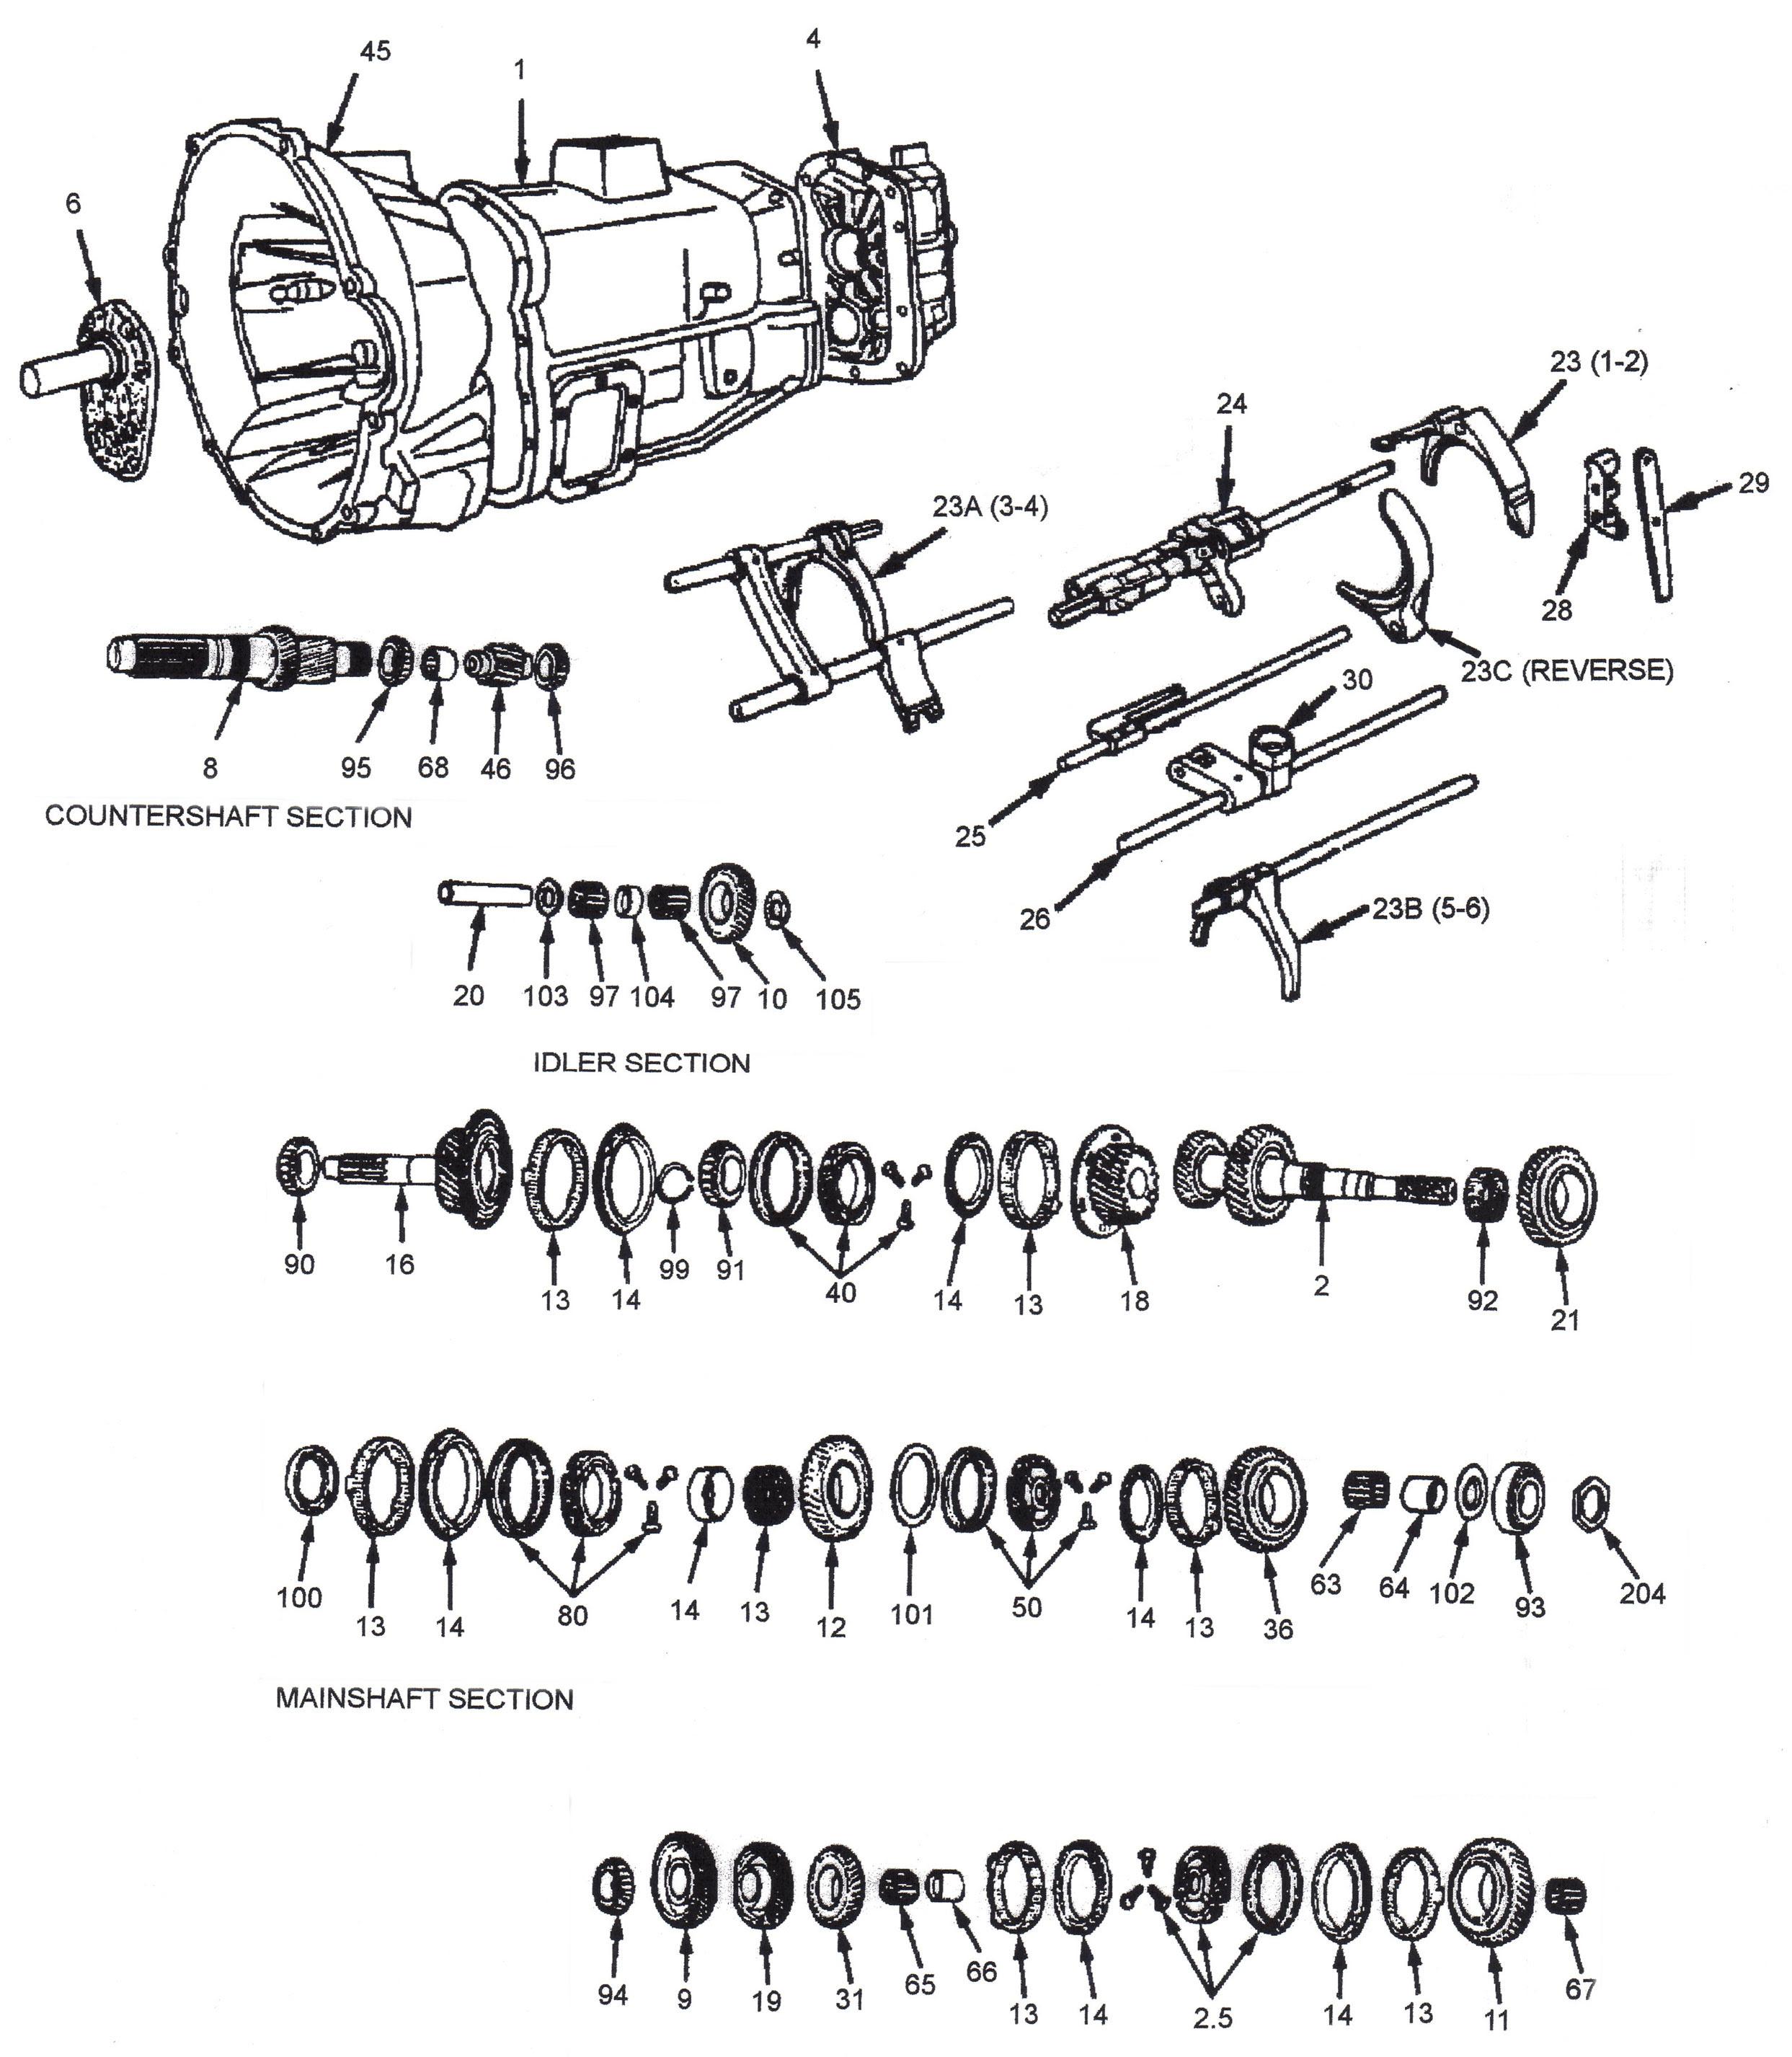 93 Info Body Kit For Nissan Urvan Pdf Engine Parts Diagram Dodge Nv5600 Transmission Speed Six Manual